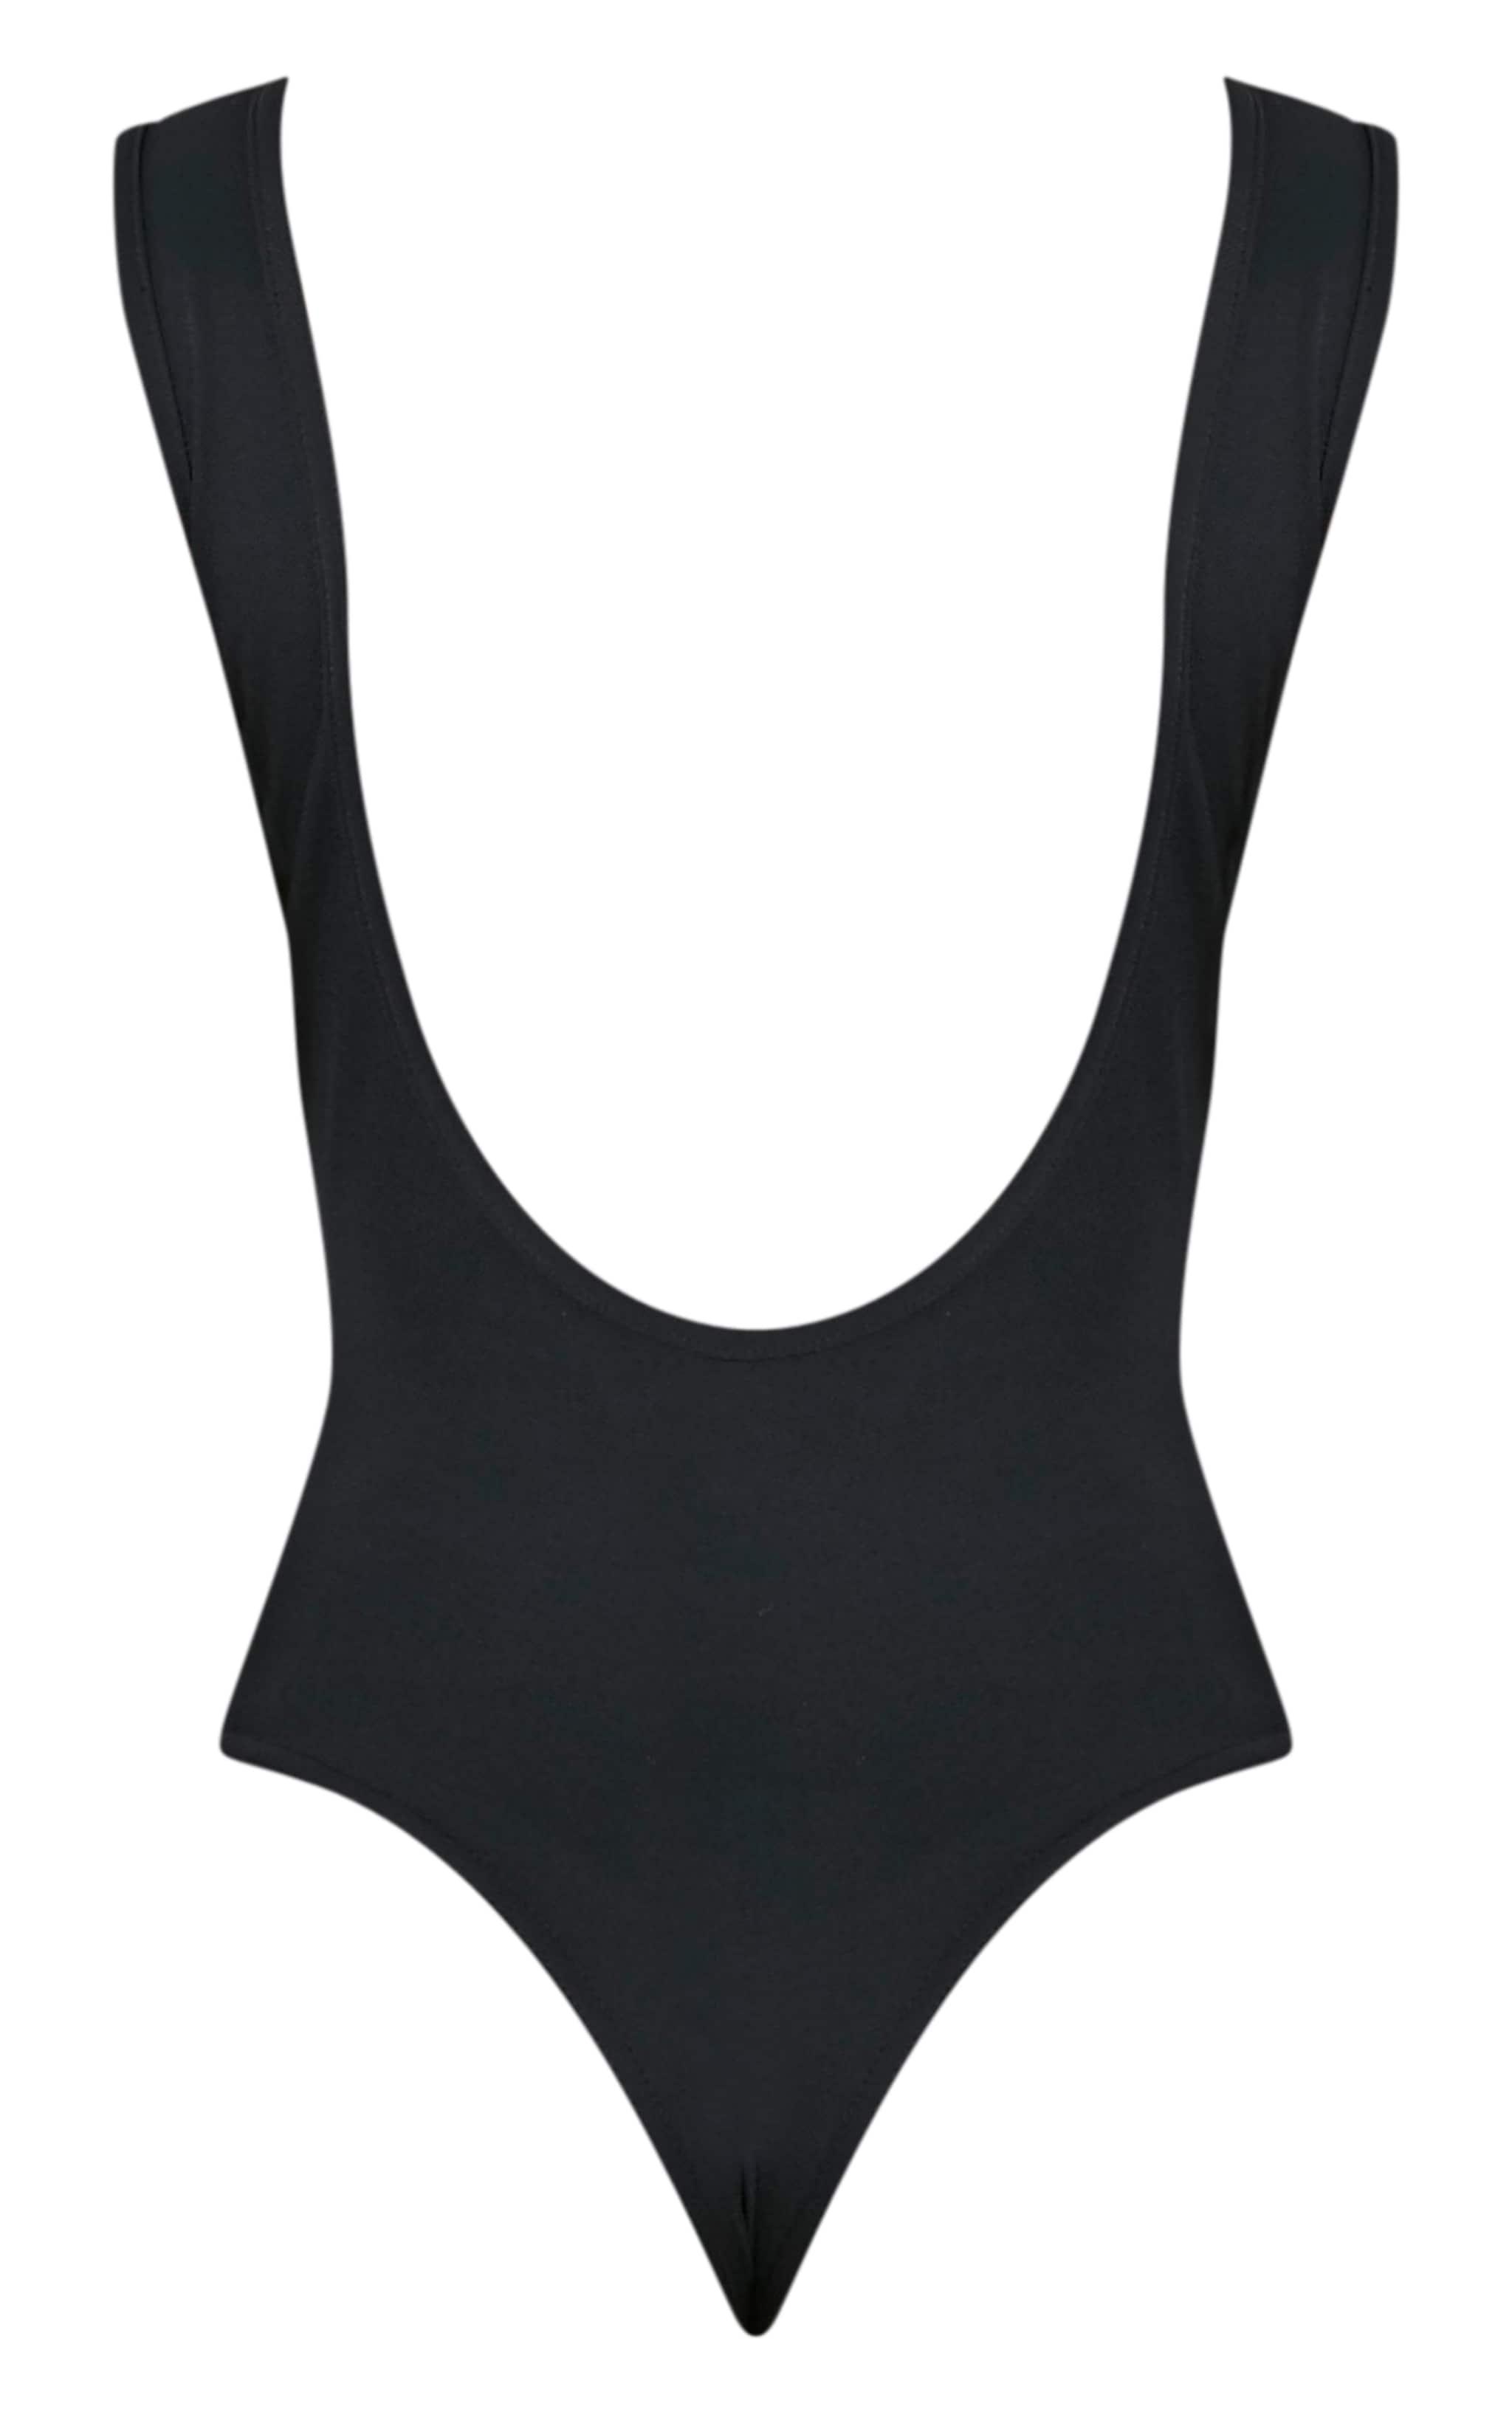 Lorelei Black Cut Out Plunge Thong Bodysuit 5